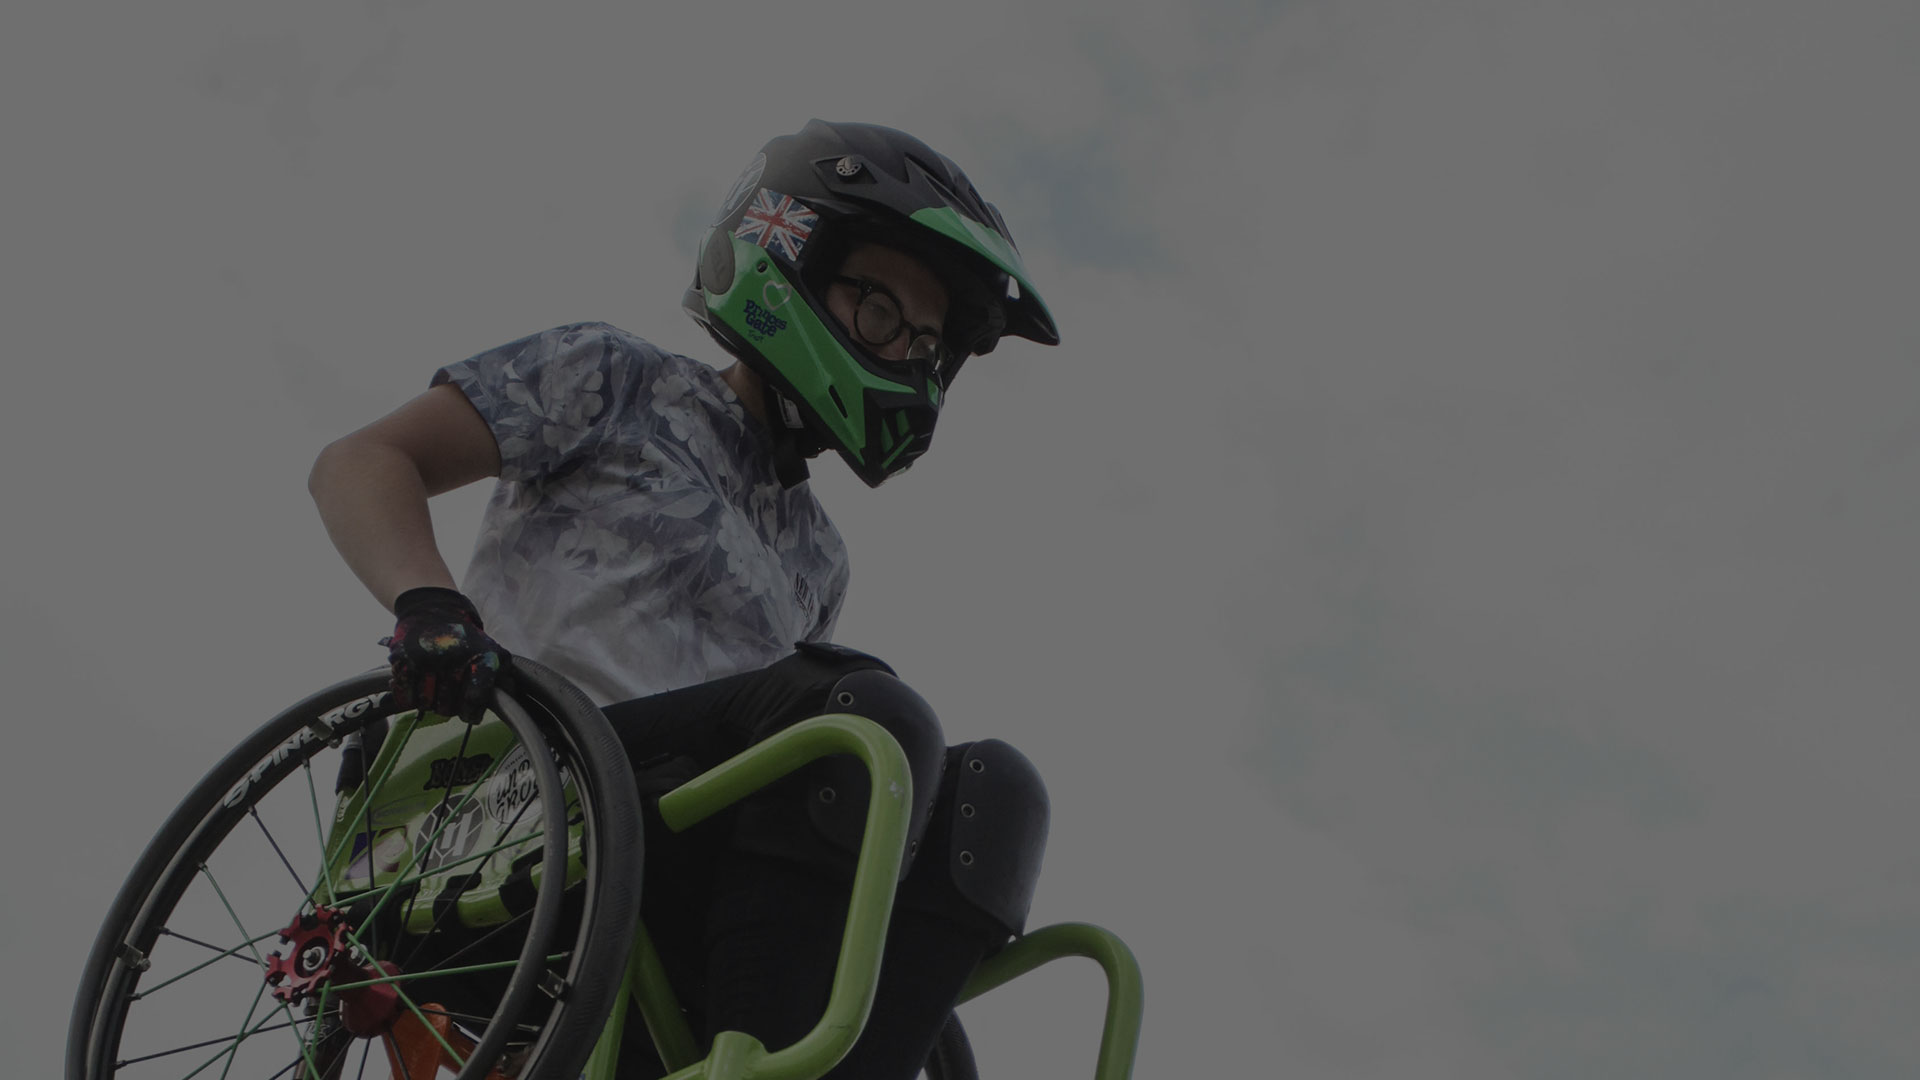 wcmx-wheelchair-spinergy-wheels-aluminium-frame-shock-absorbers-rmasport-rma-sport-lily-rice